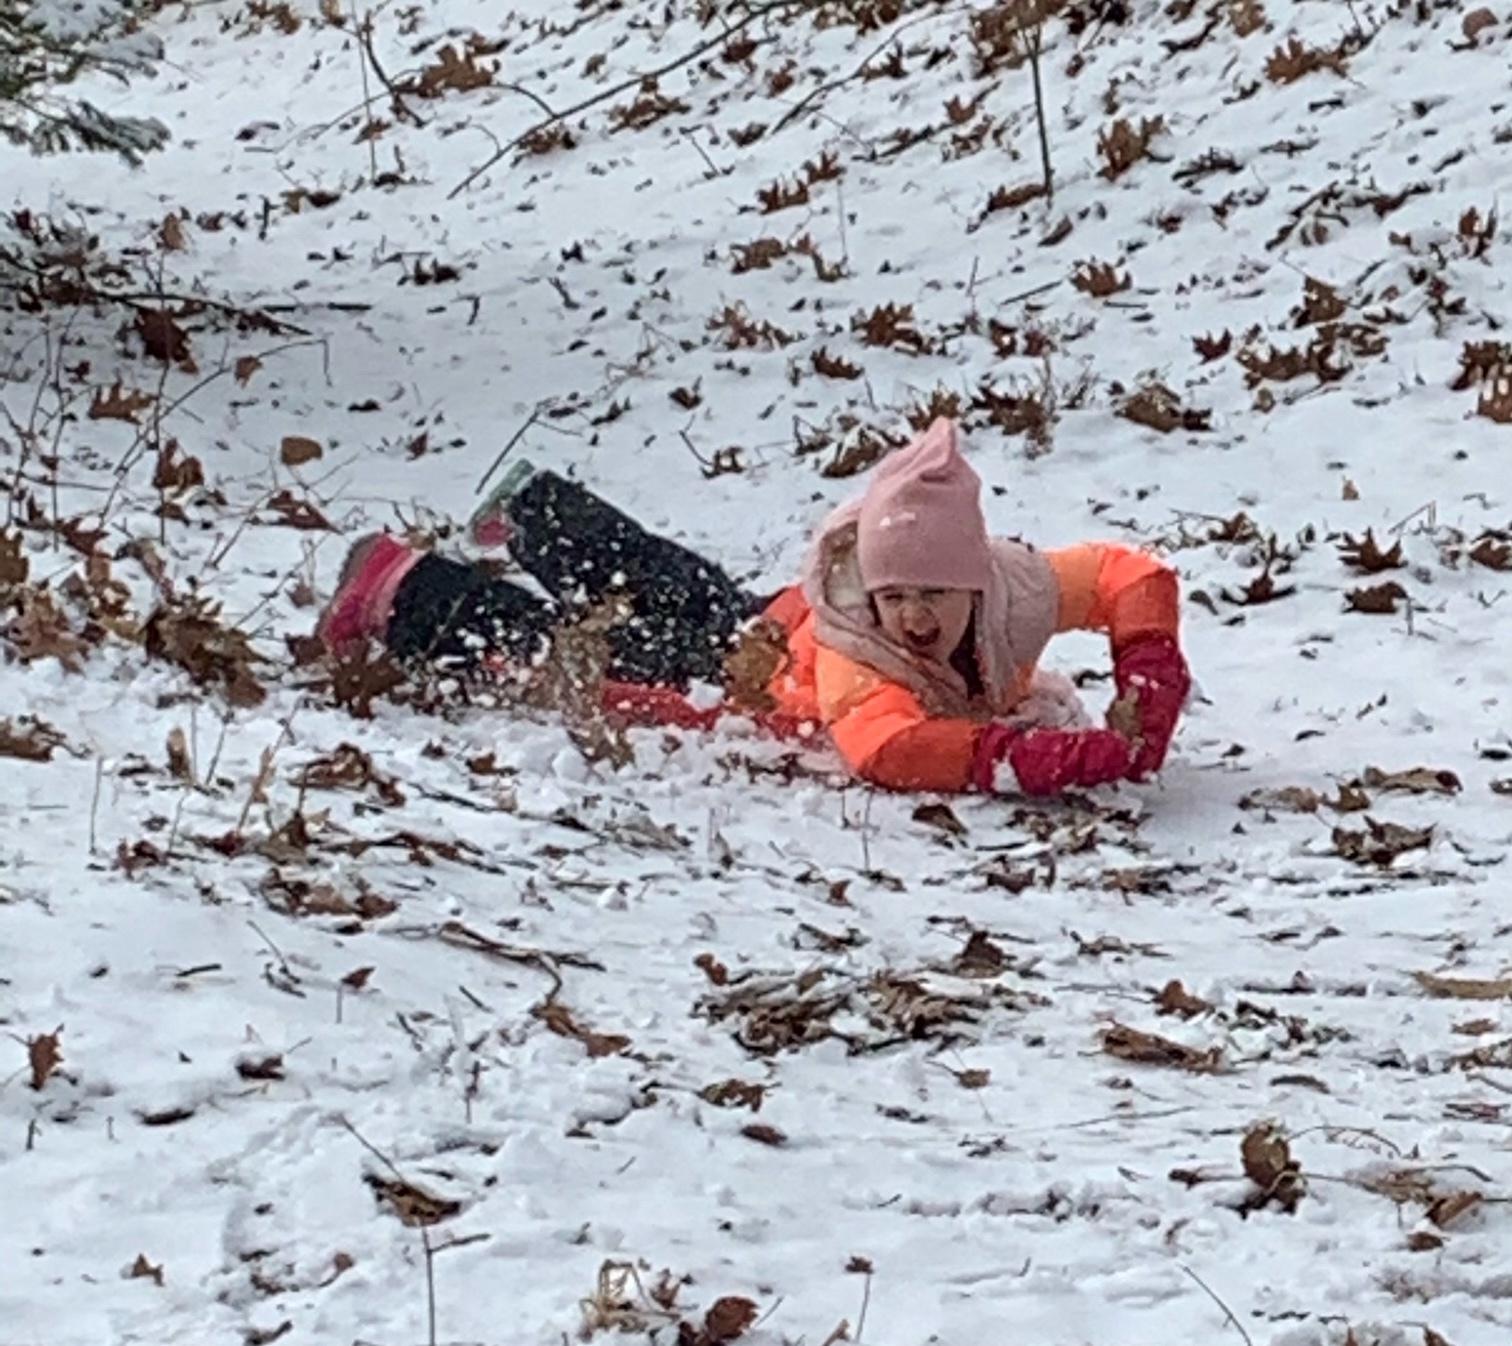 PreK Laugh Learn 6 Week 3 Winter Games 2021 Moment of the Week